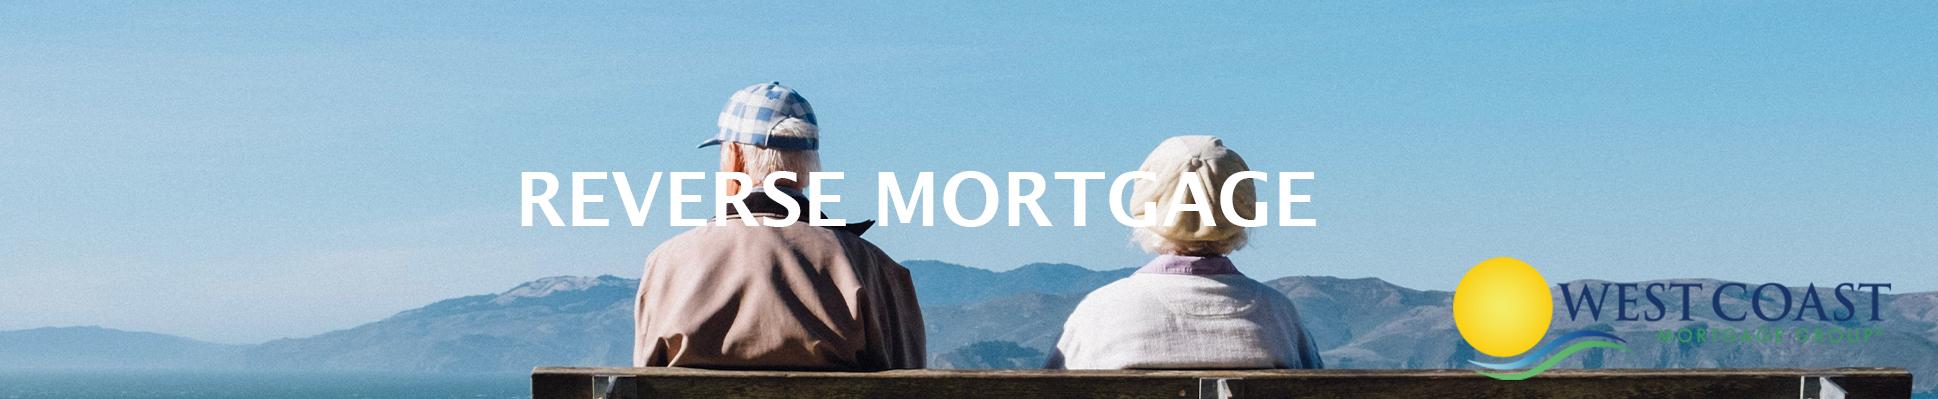 reverse mortgage west coast mortgage group